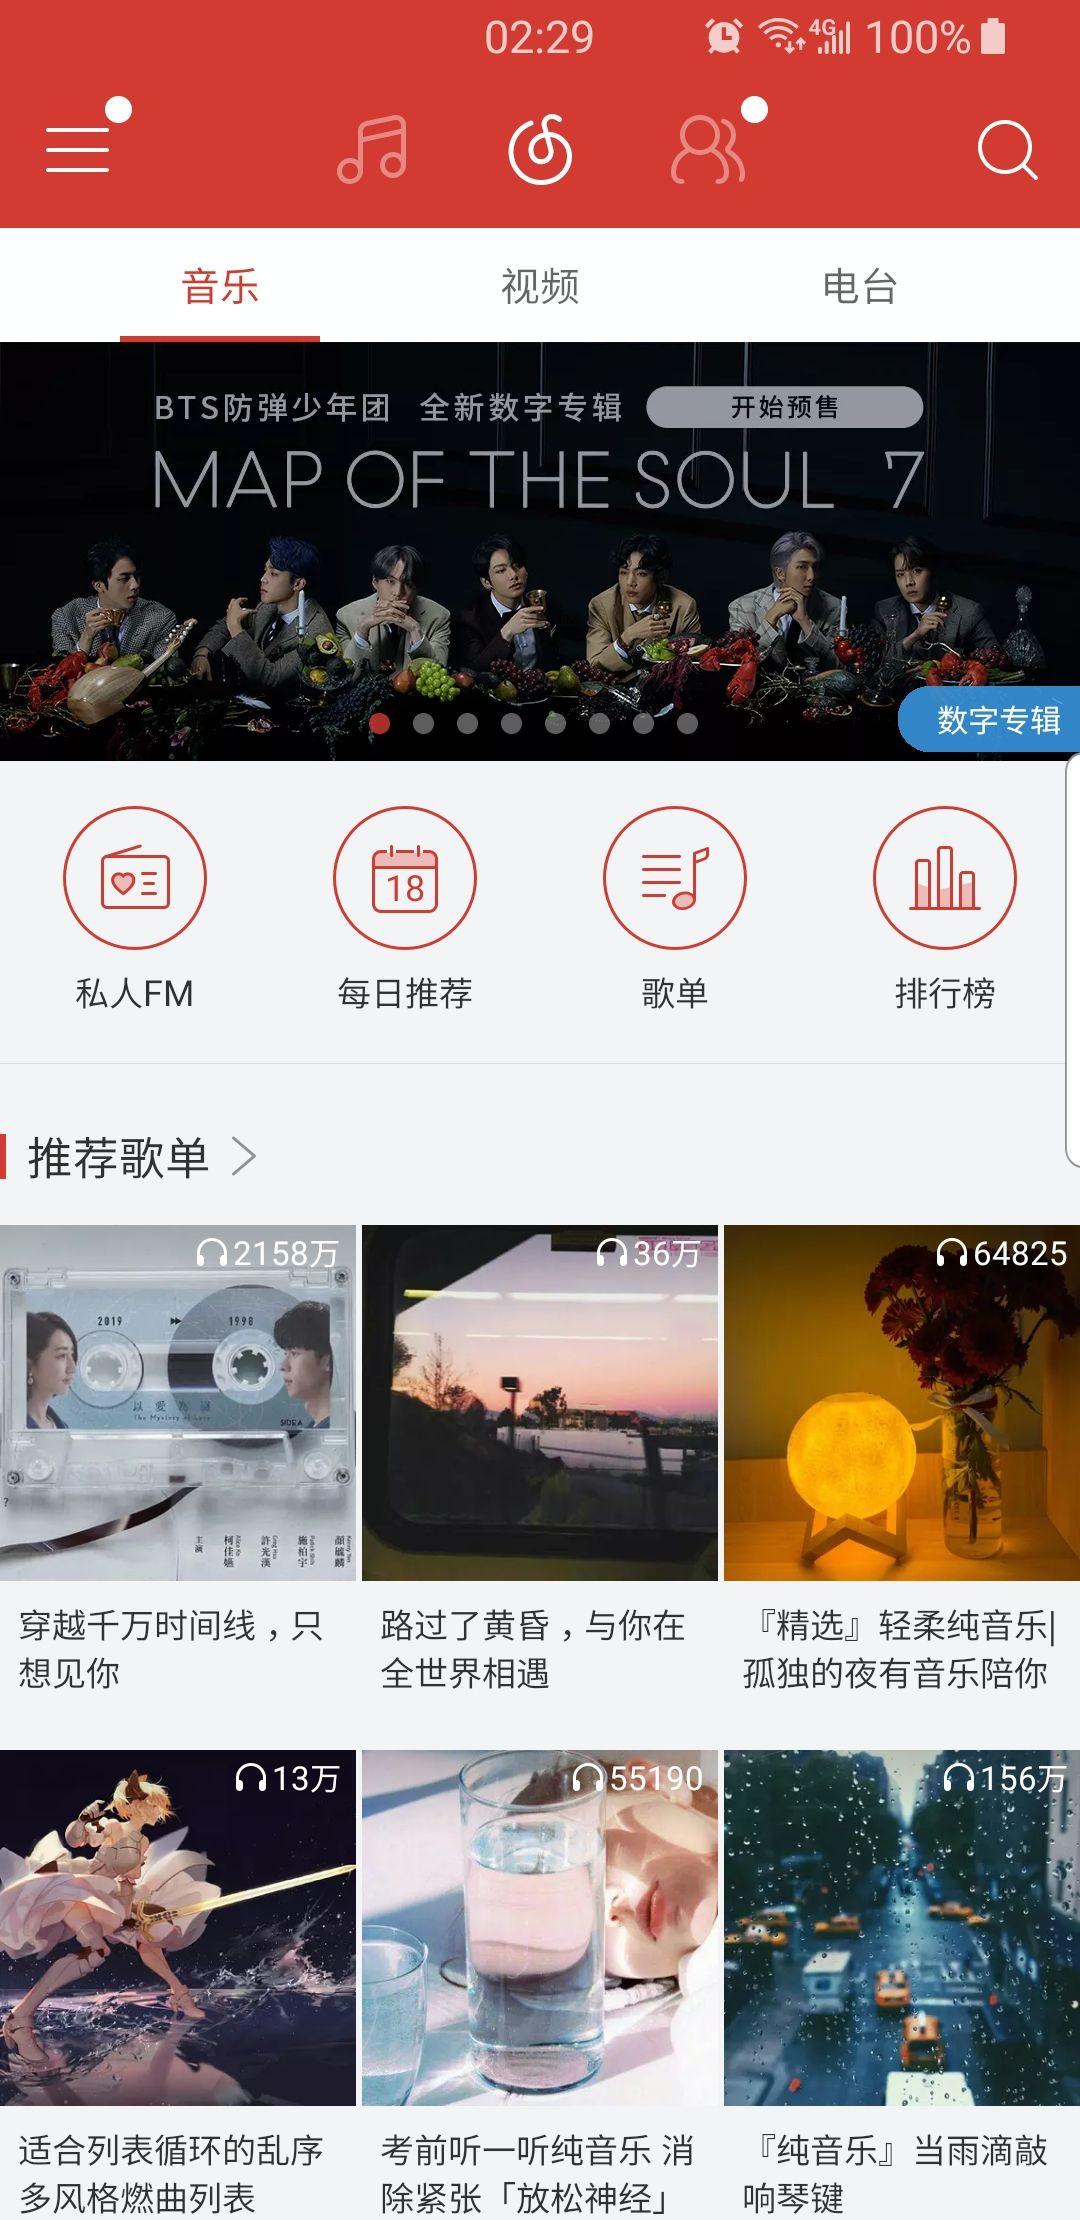 5e4ae2cf1ea46 - Android | 网易云音乐 Google Play 下架前最后一版,无登录广告